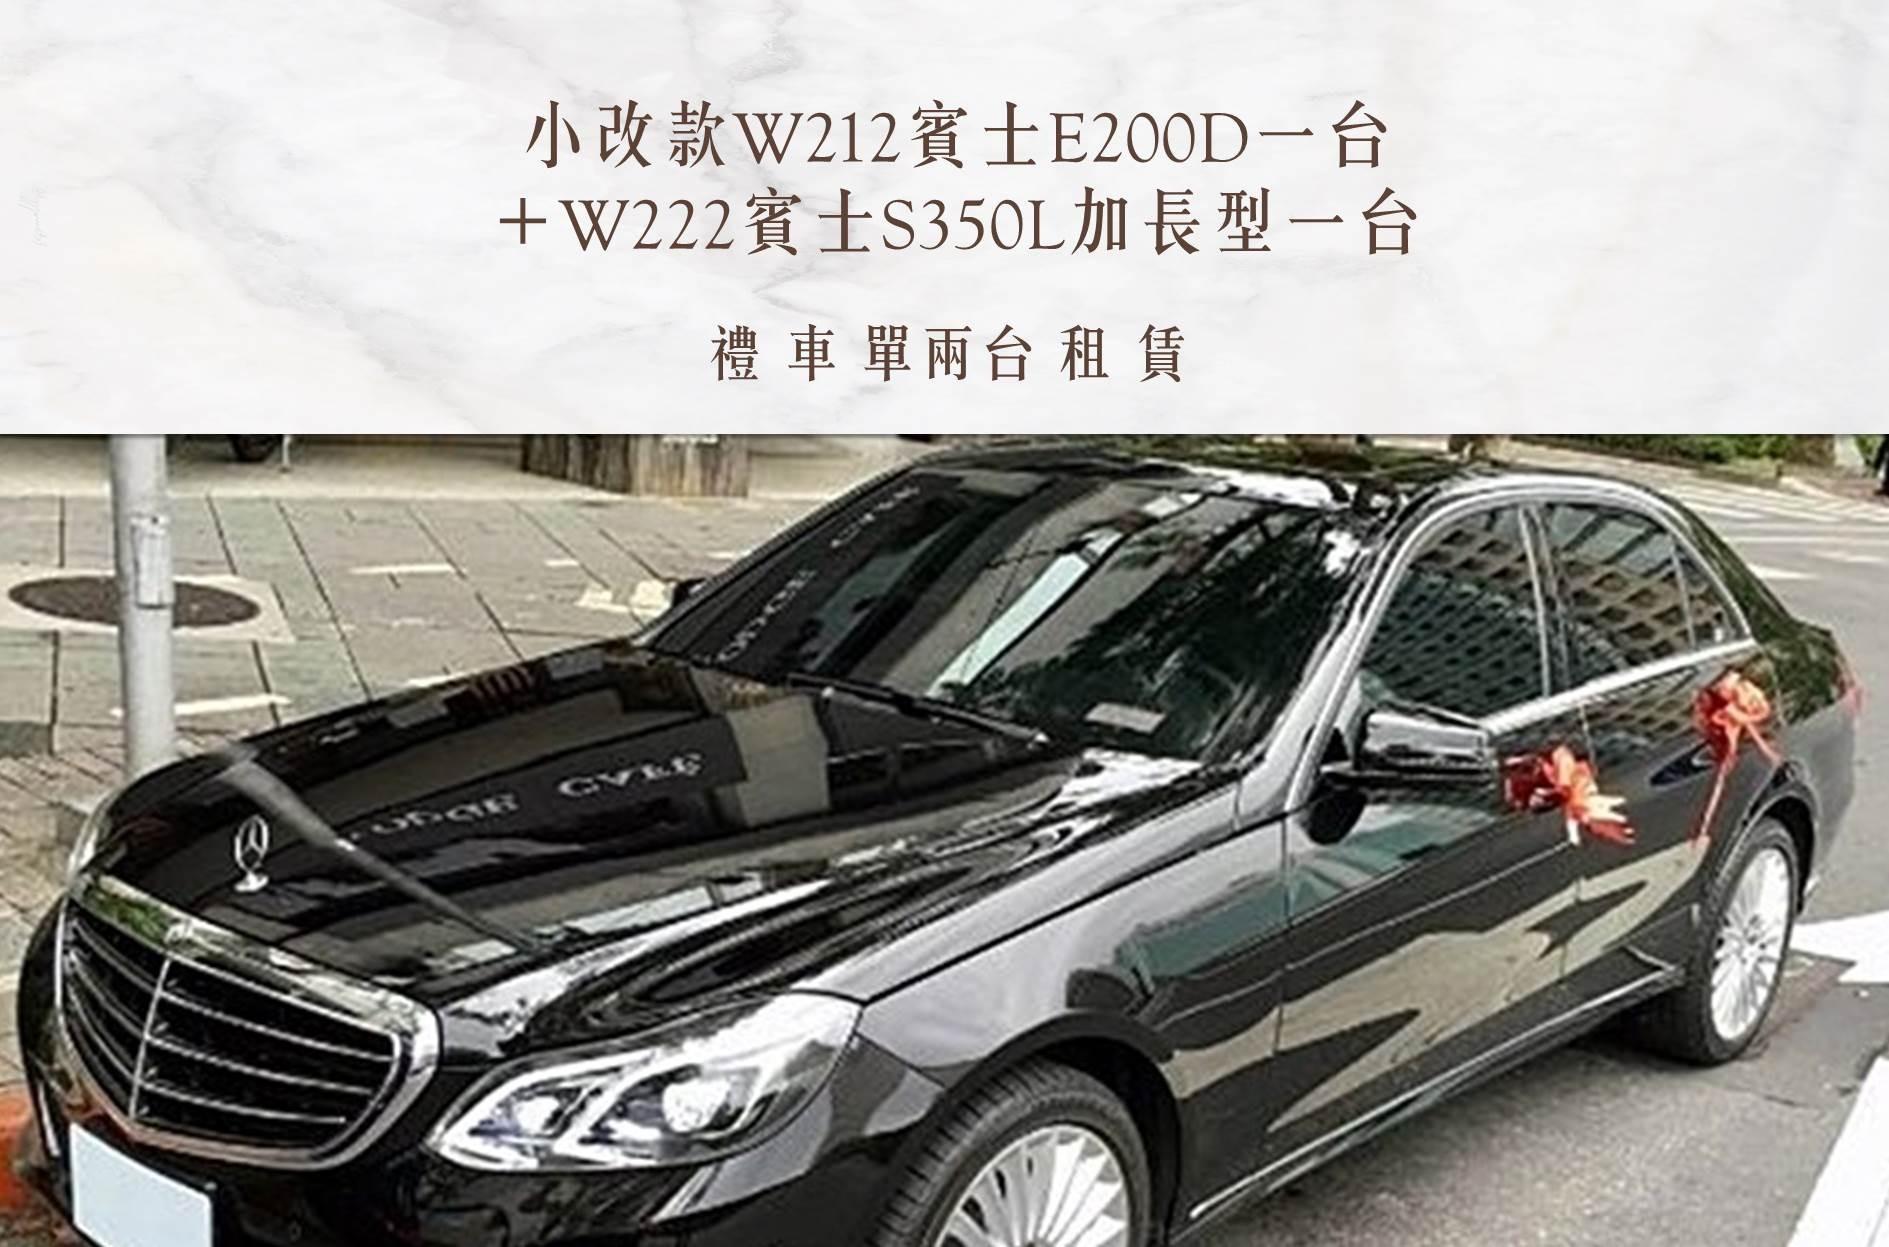 小改款W212賓士E200D一台+W222賓士S350L加長型一台